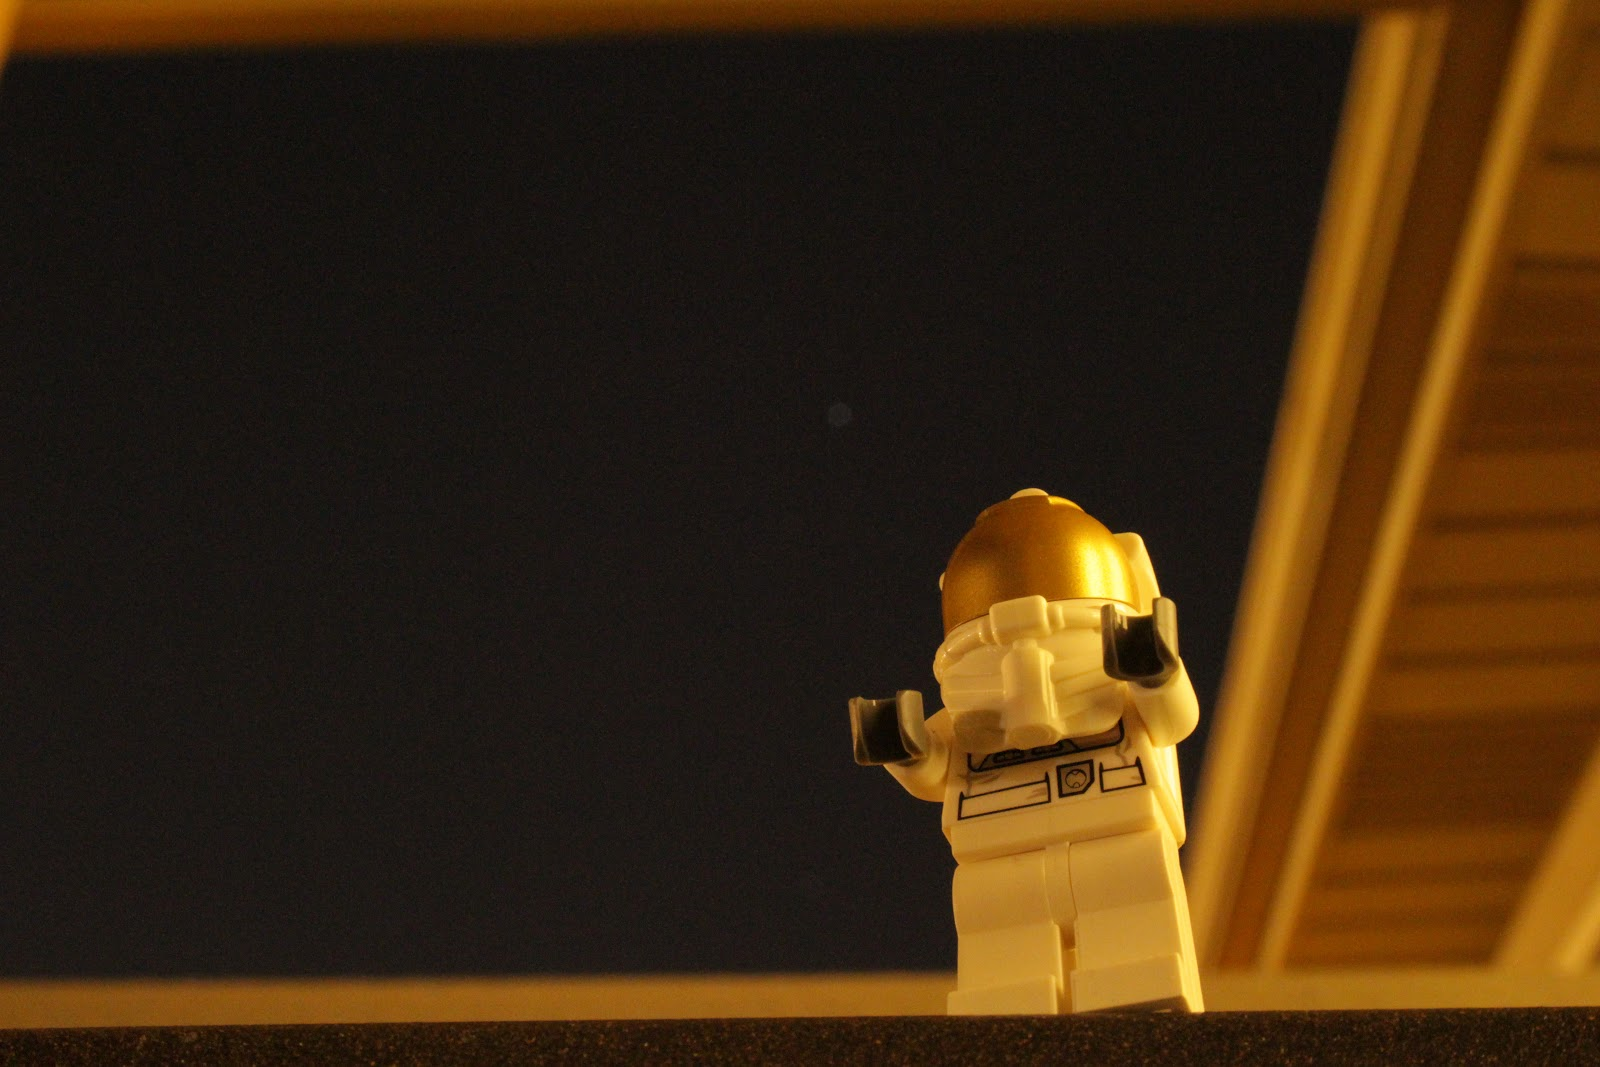 Lego astronaut figure